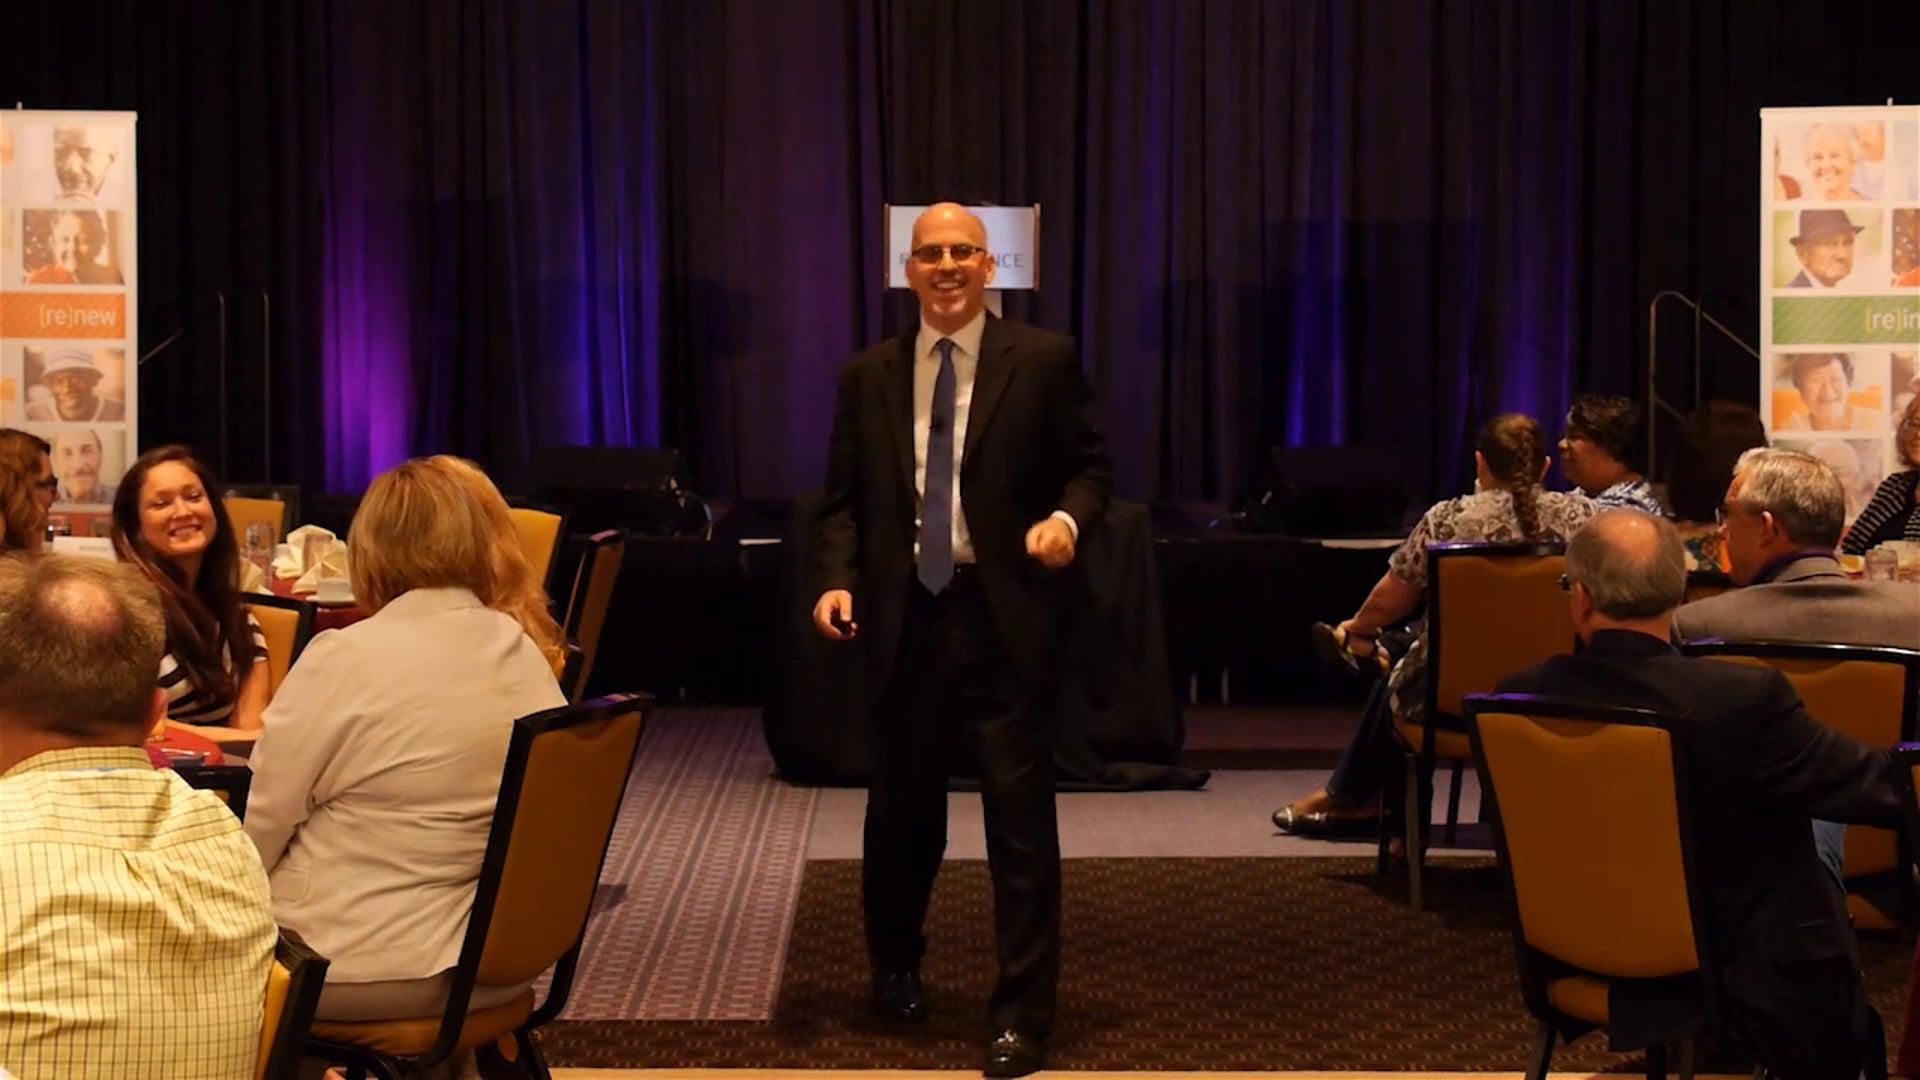 Leadership training with Dr. Joe Serio